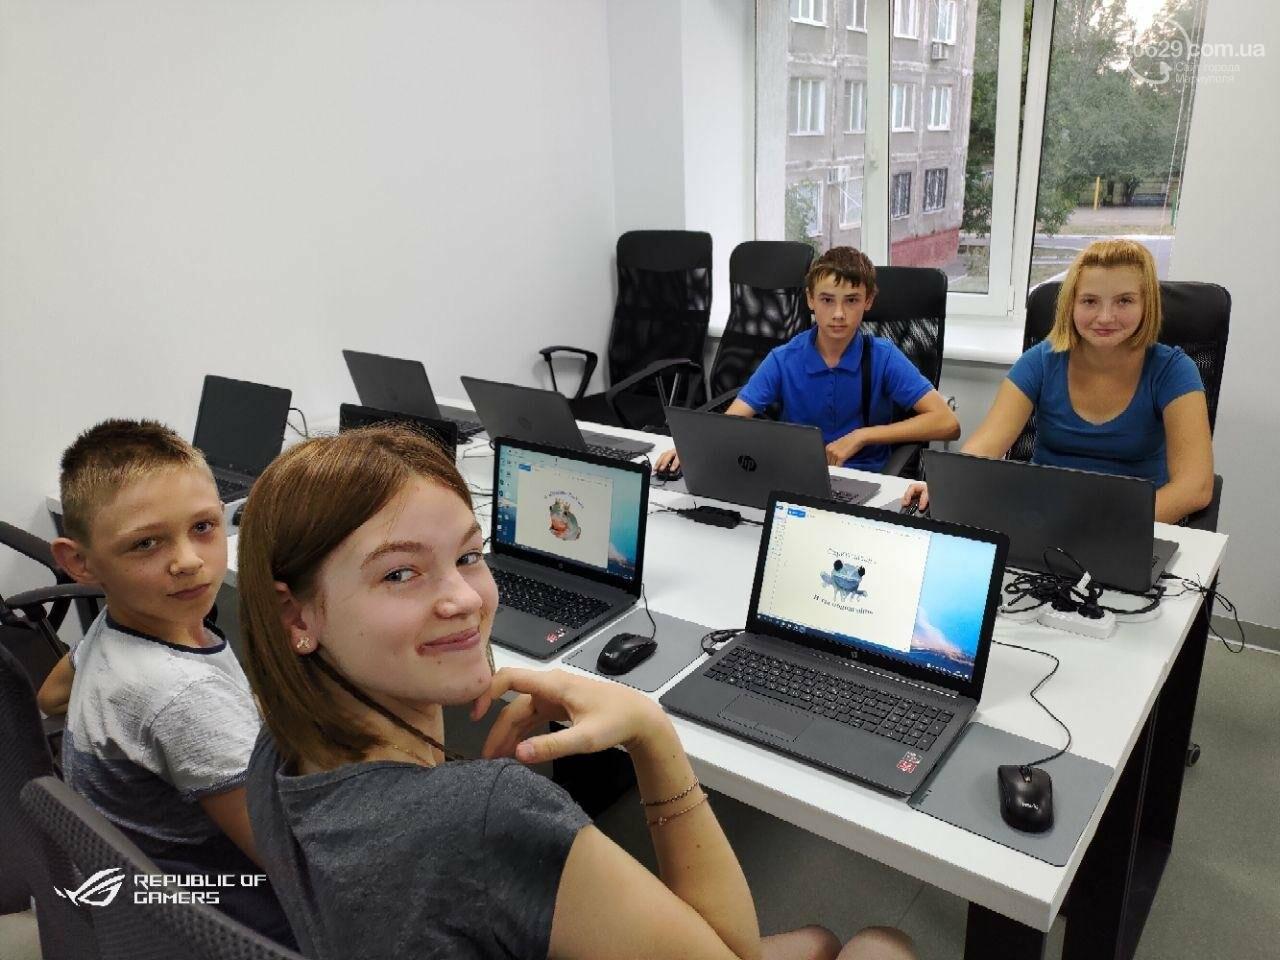 Не нужно ждать! Запиши ребенка на пробное занятие от IT-академии BYTE!, фото-2